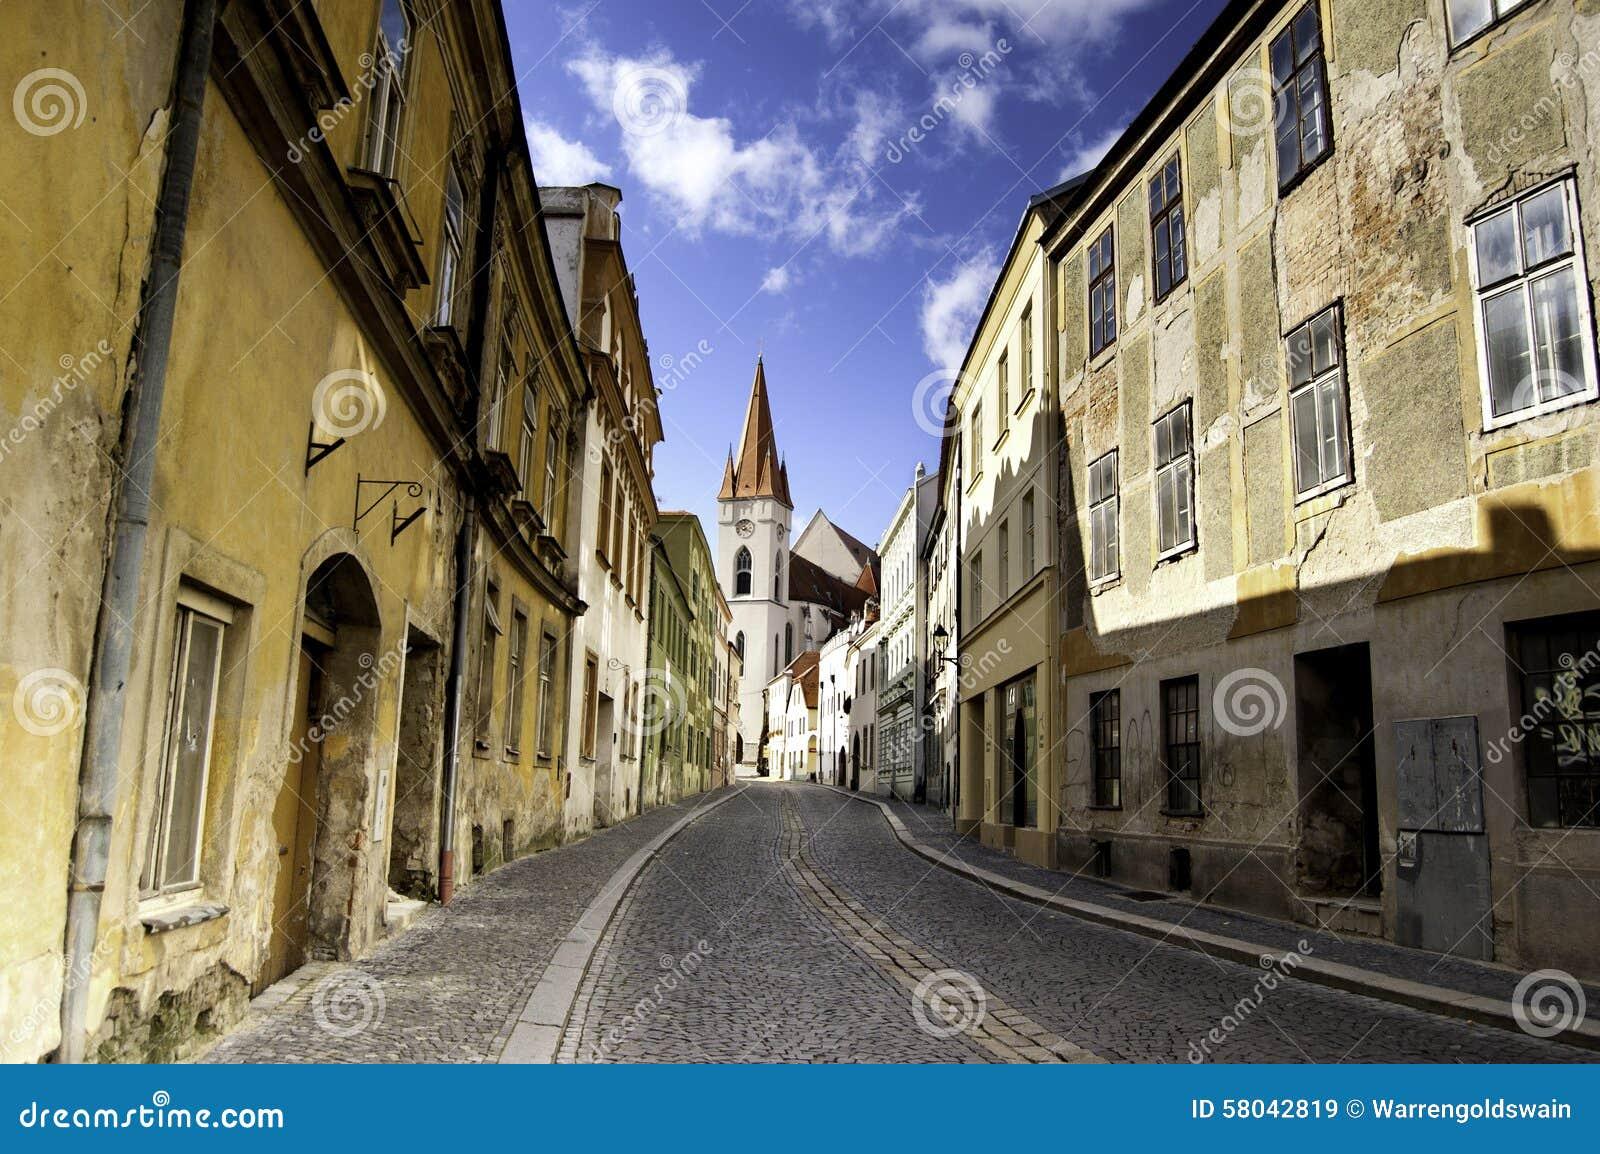 Empty Cobblestone Street In Znojmo, Czech Republic Stock ...